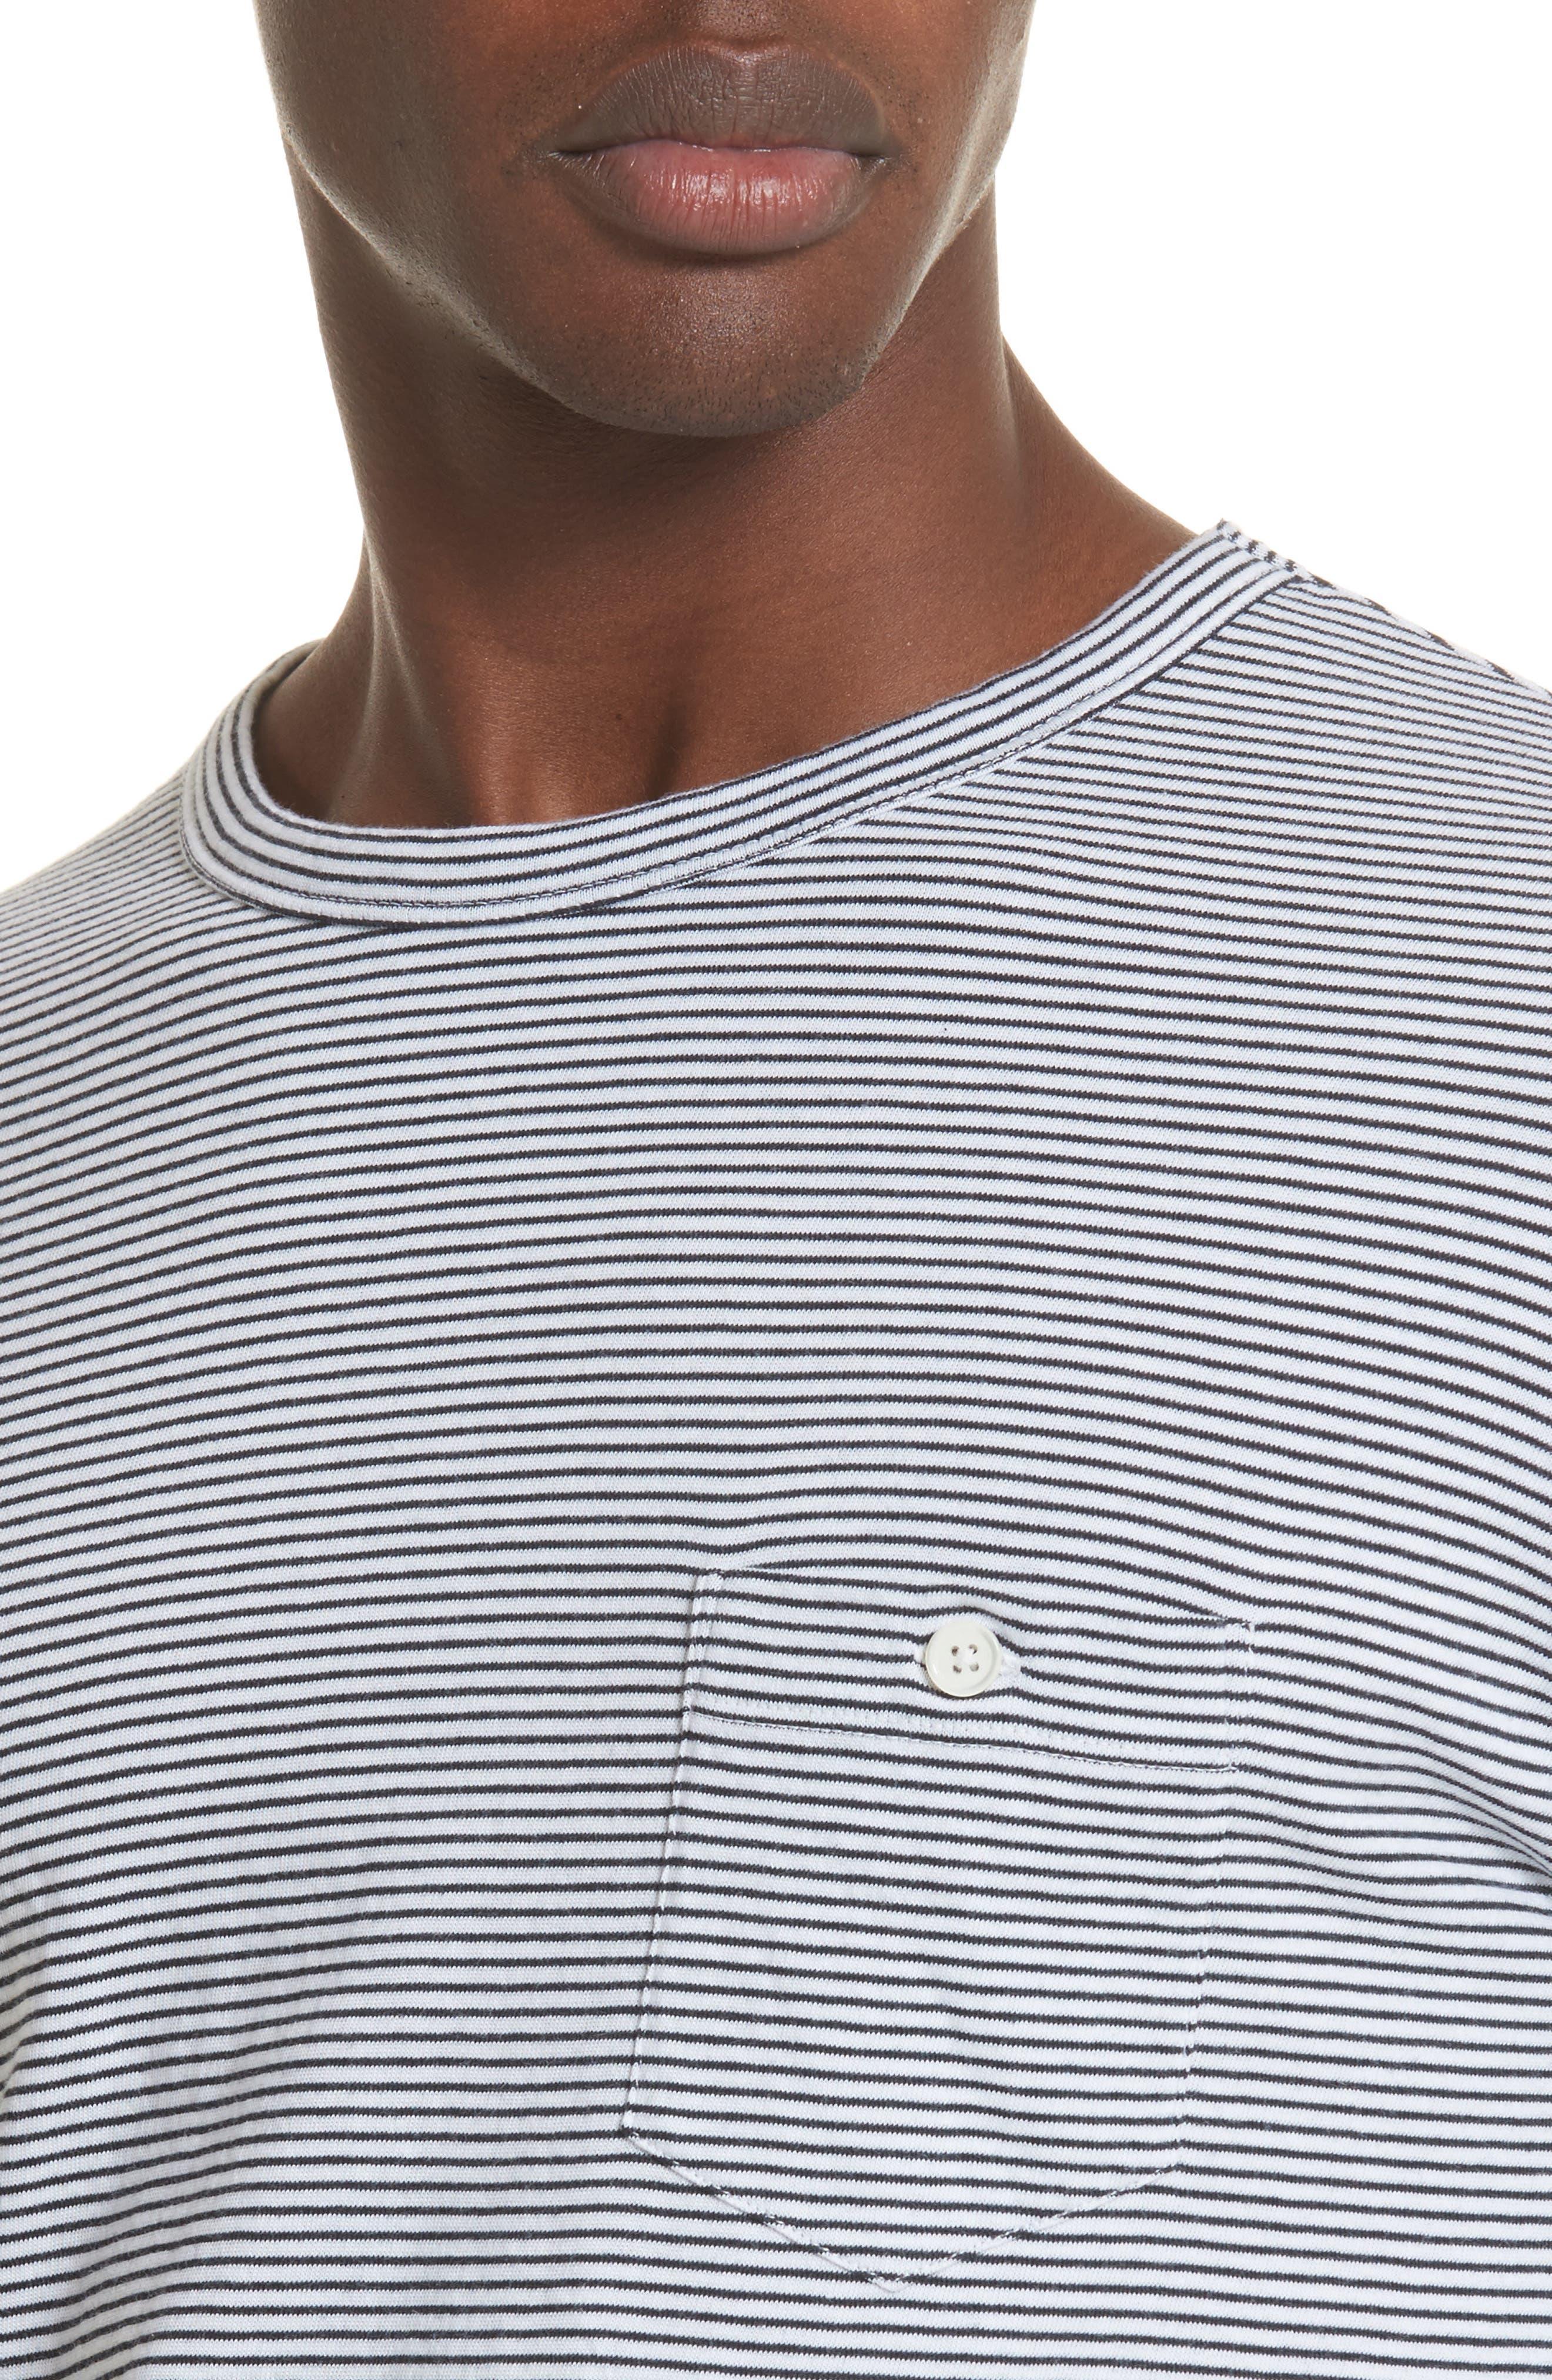 Stripe Long Sleeve T-Shirt,                             Alternate thumbnail 4, color,                             NAVY